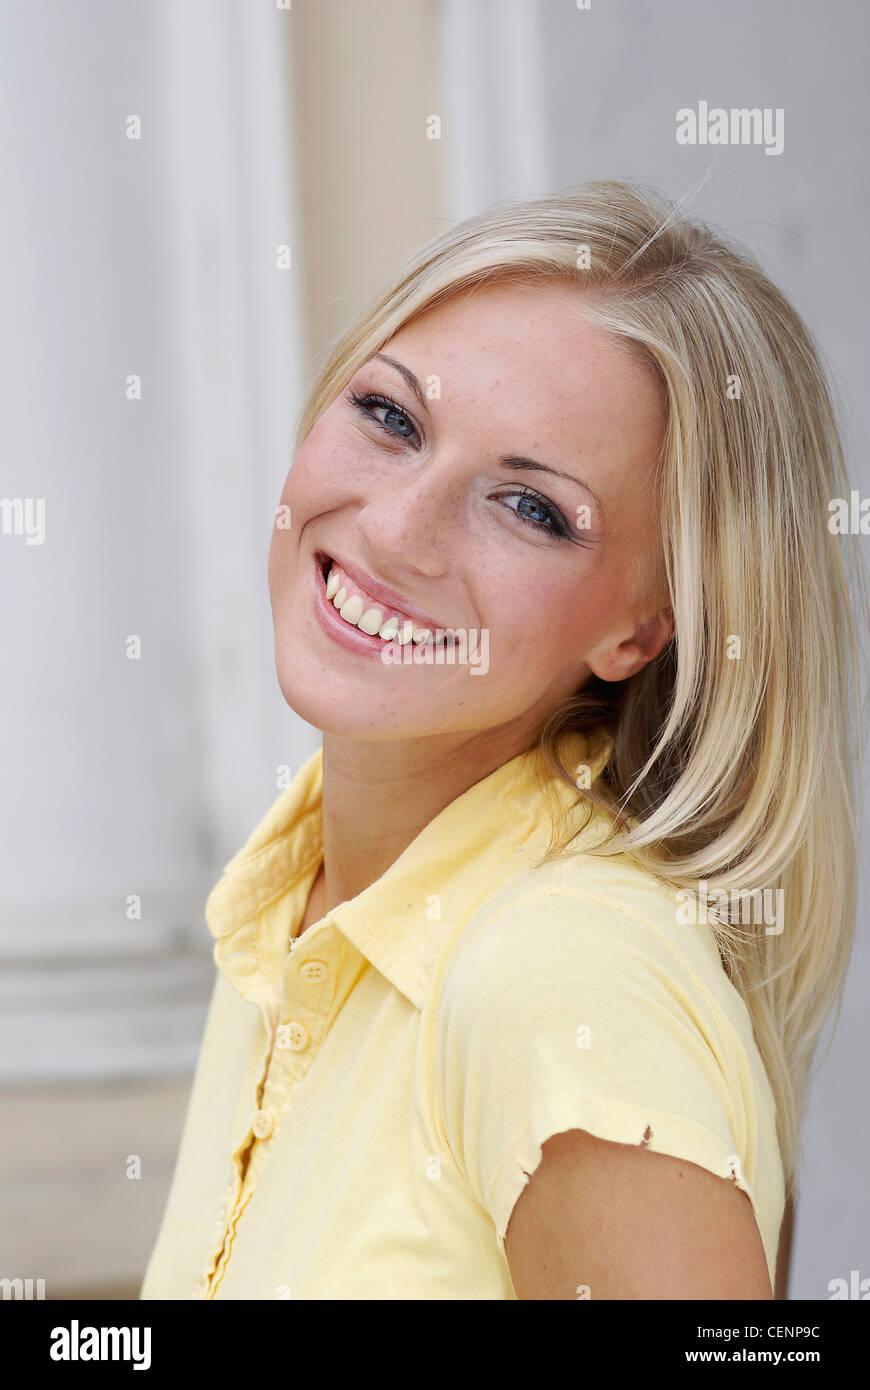 Femmina lunghi capelli biondi 6db73844d56